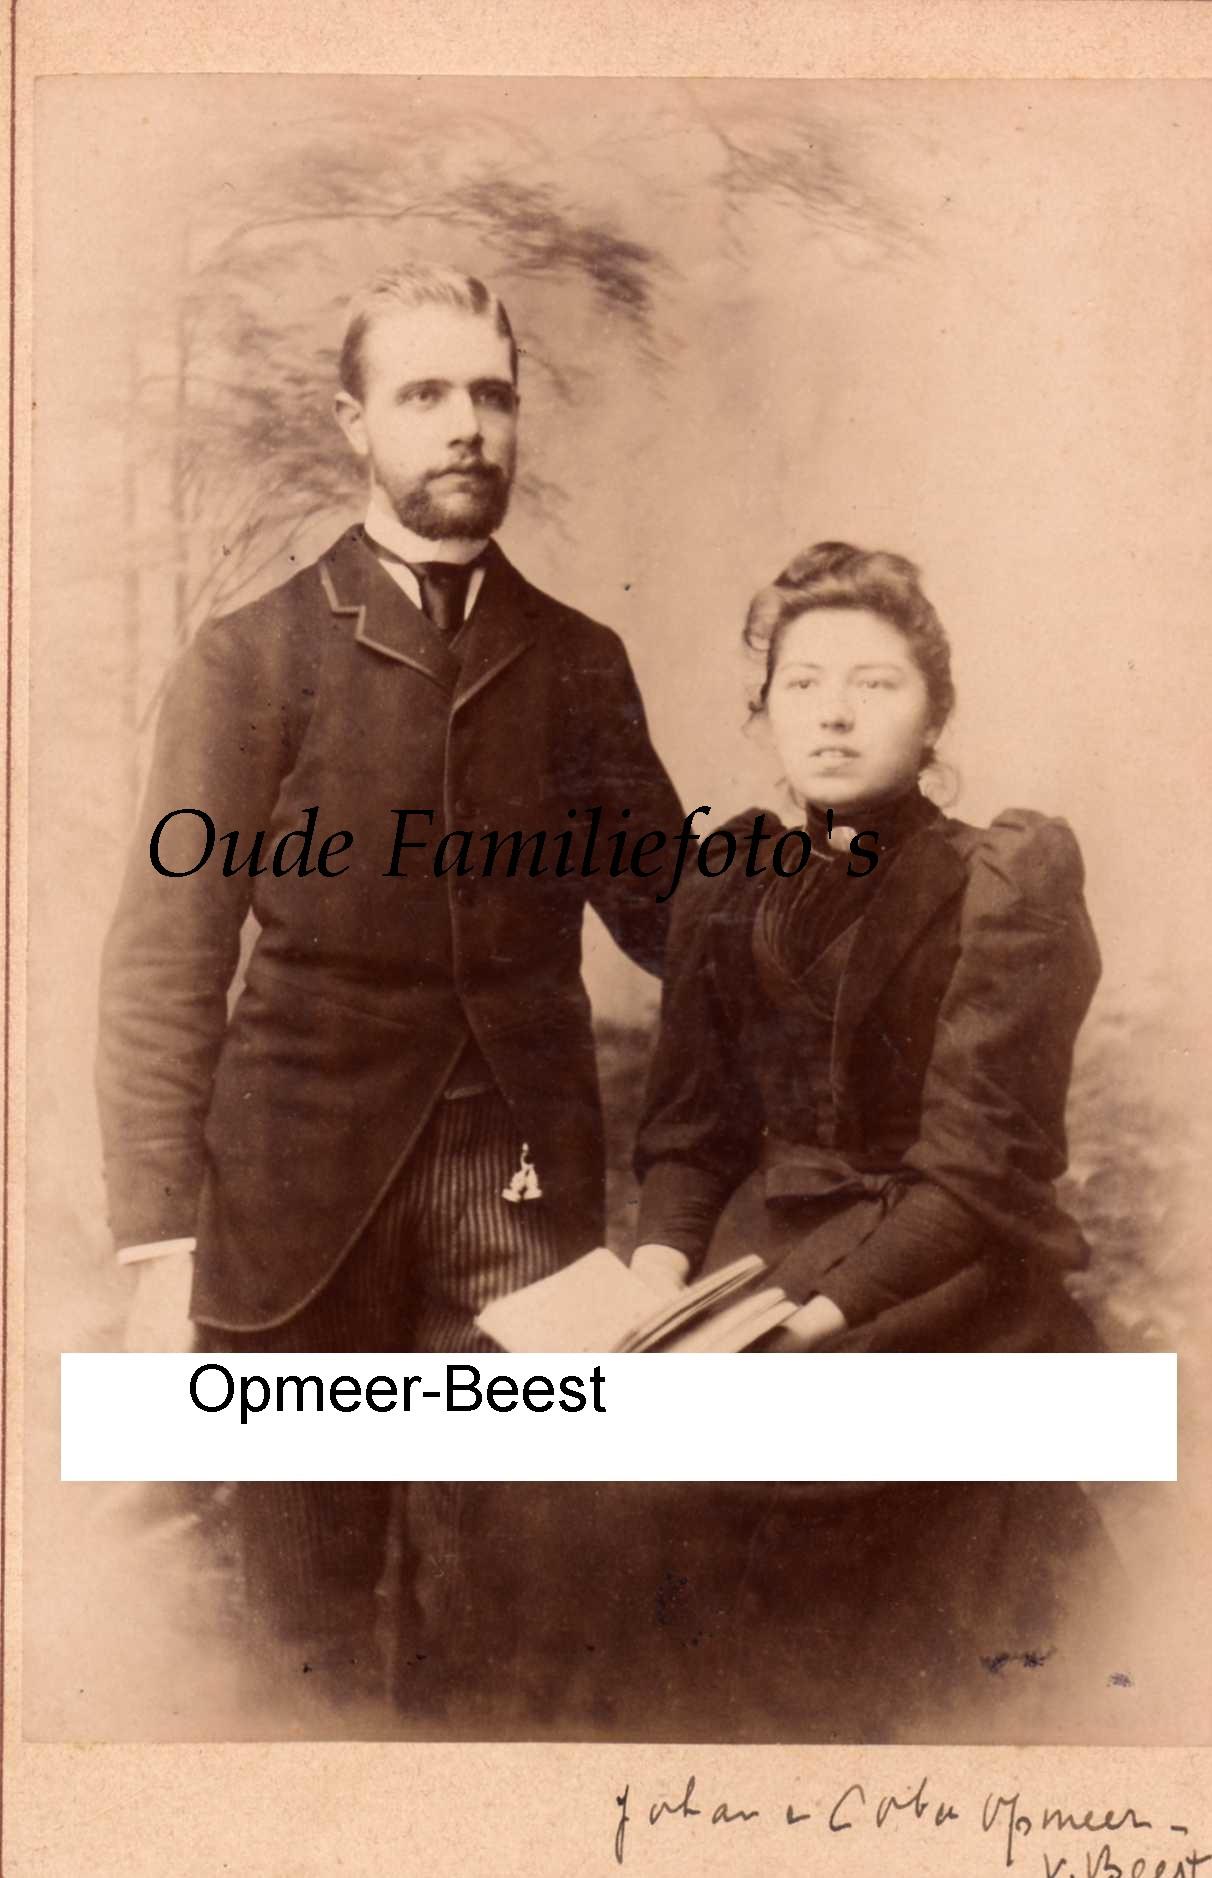 Opmeer, Johannes Leonardus Jacobus. Geb. 27-9-1869 Den-Haag Ovl. 21-10-1904 Ede getrouwd net o.a J.E van Beest. € 4,00